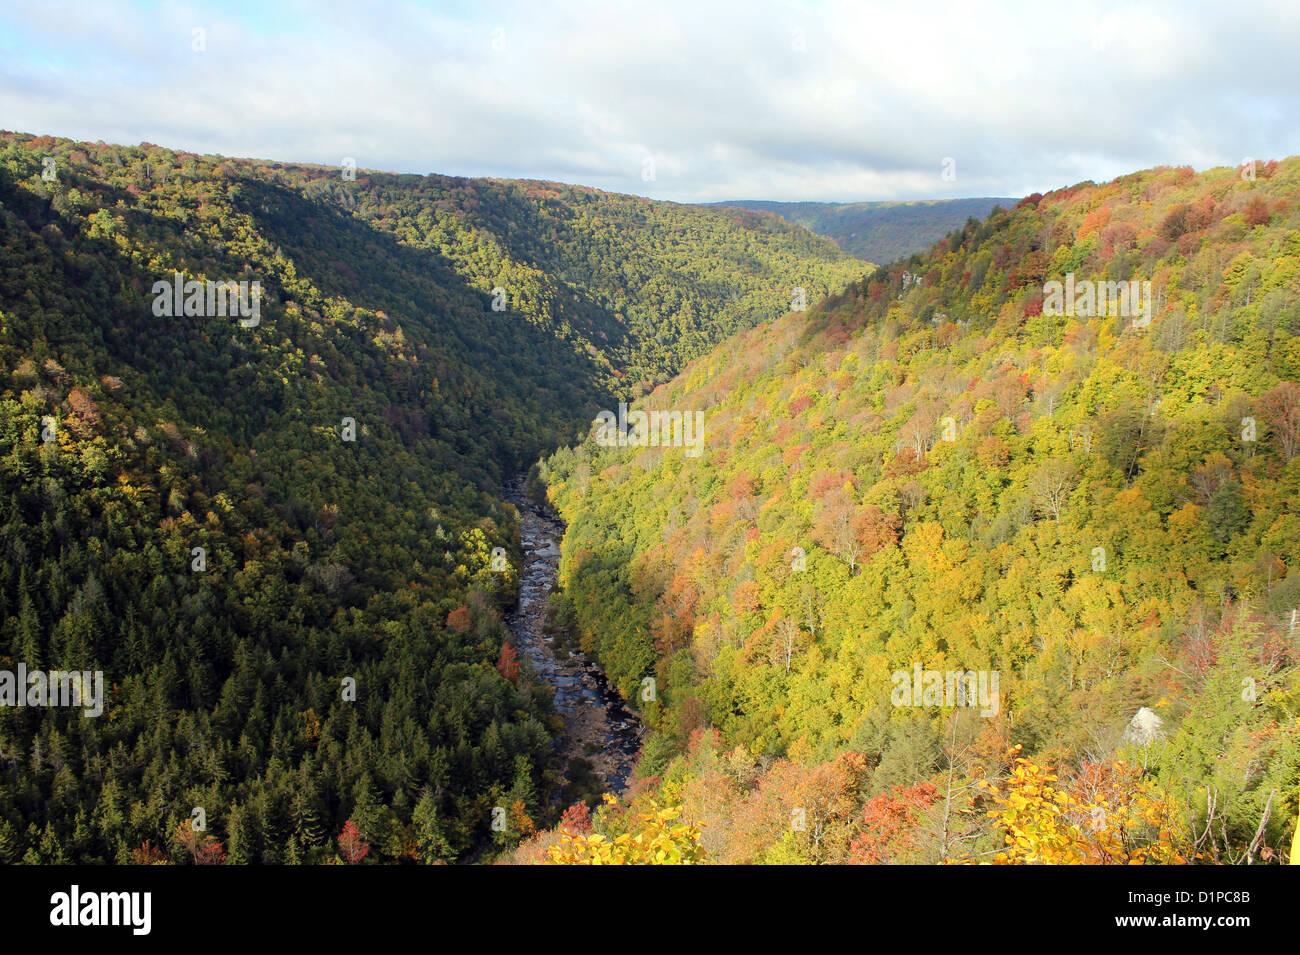 Blackwater Falls State Park, West Virginia, America, USA - Stock Image